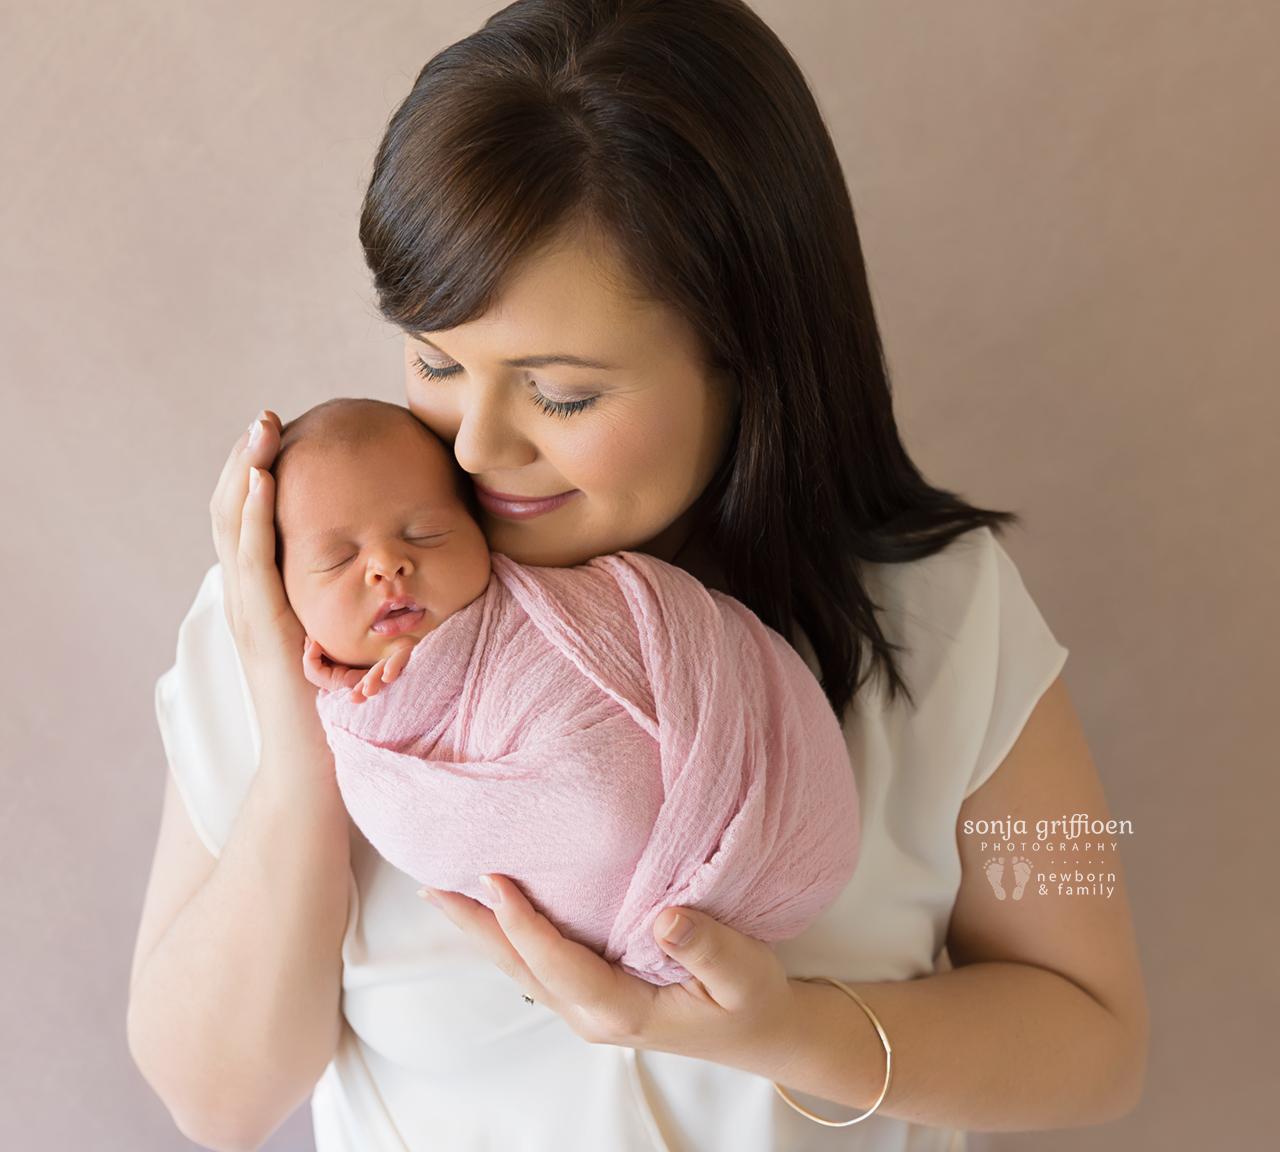 Lilly-Newborn-Brisbane-Newborn-Photographer-Sonja-Griffioen-15.jpg